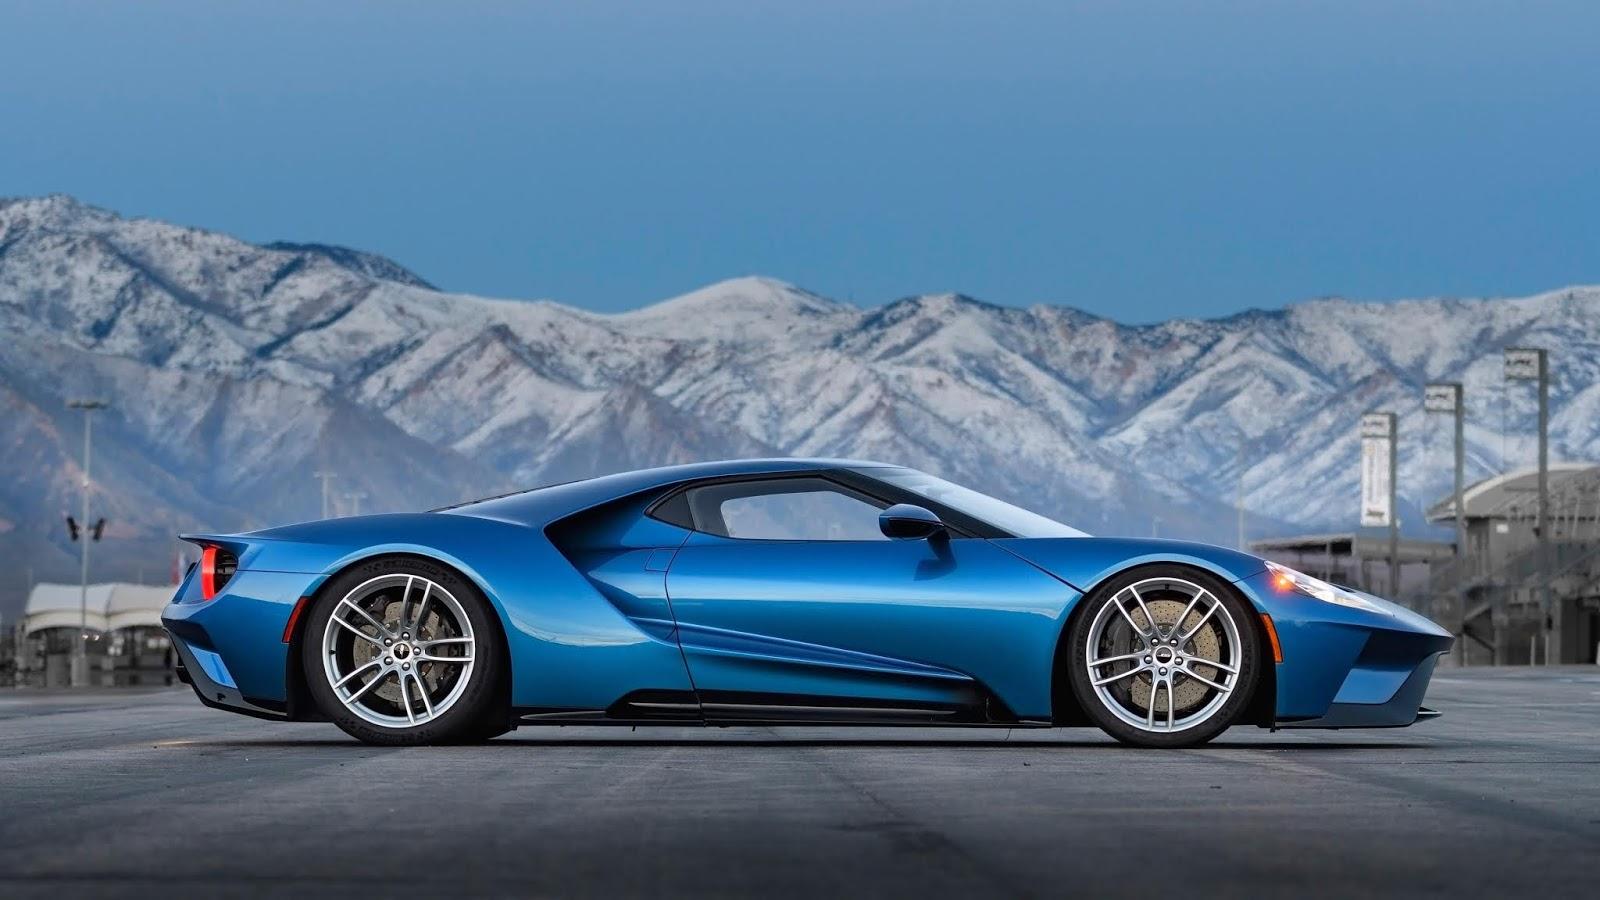 wonderful Cars   4K Wallpapers خلفيات سيارات رائعة